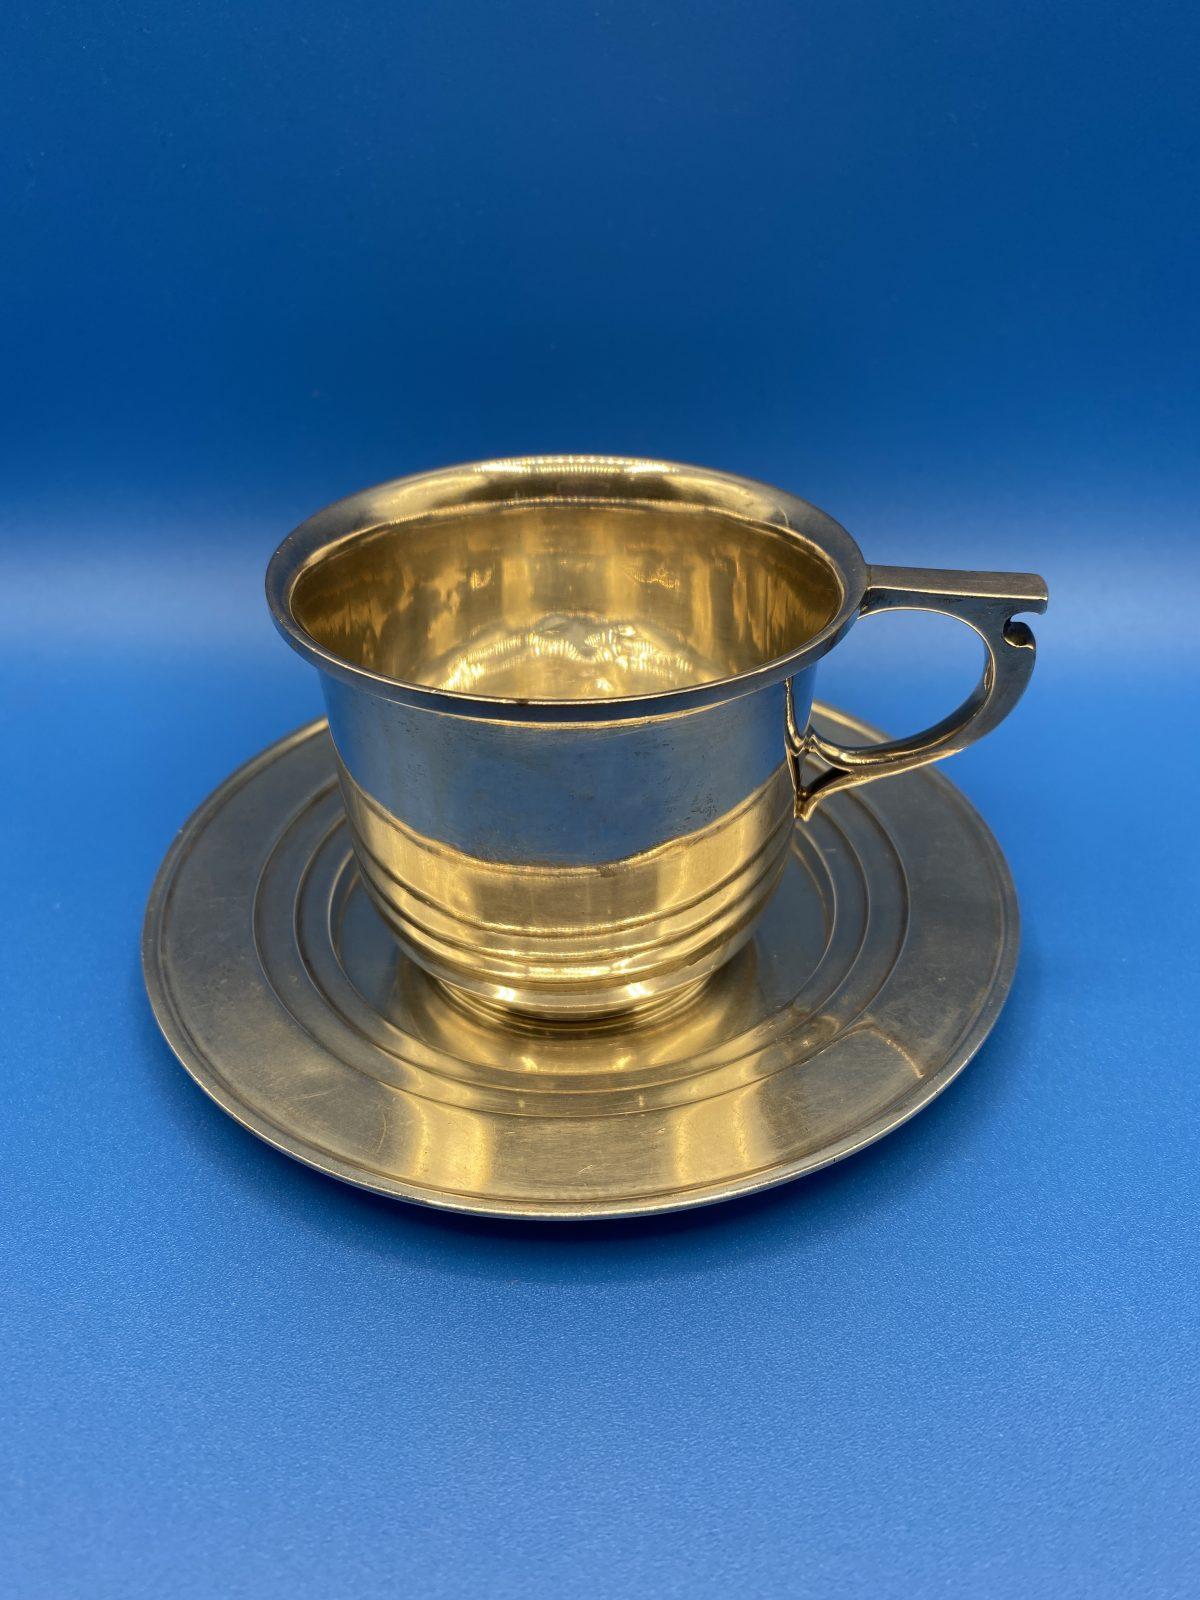 G3 - A Silver Cup & Saucer by Adie Bros, Birmingham 1930.  £180